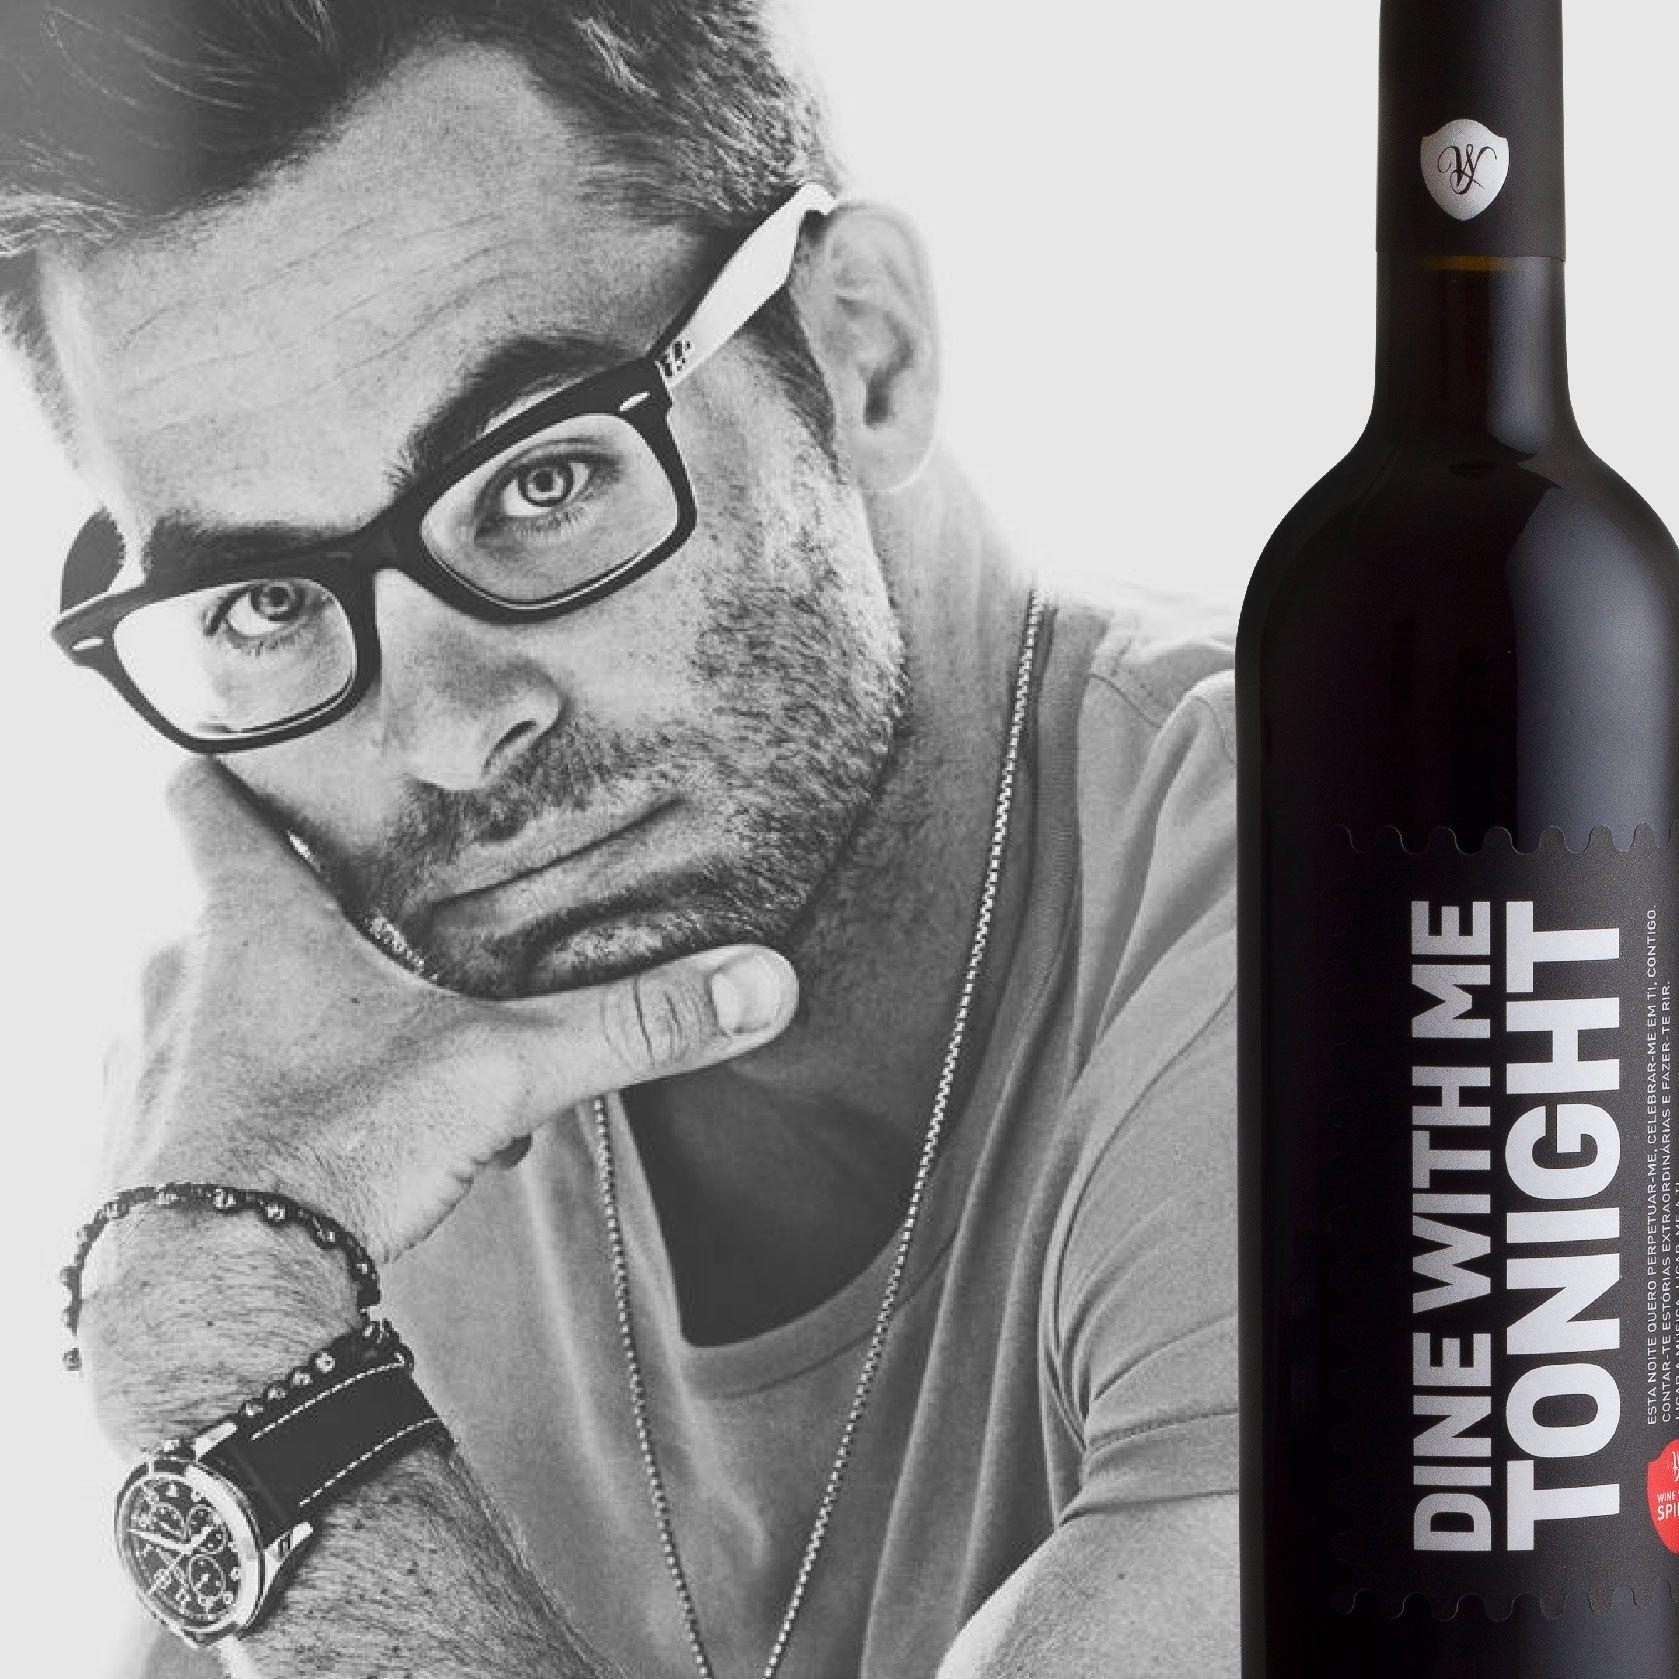 www.winewithspirit.net https://www.facebook.com/winedinewithmetonight